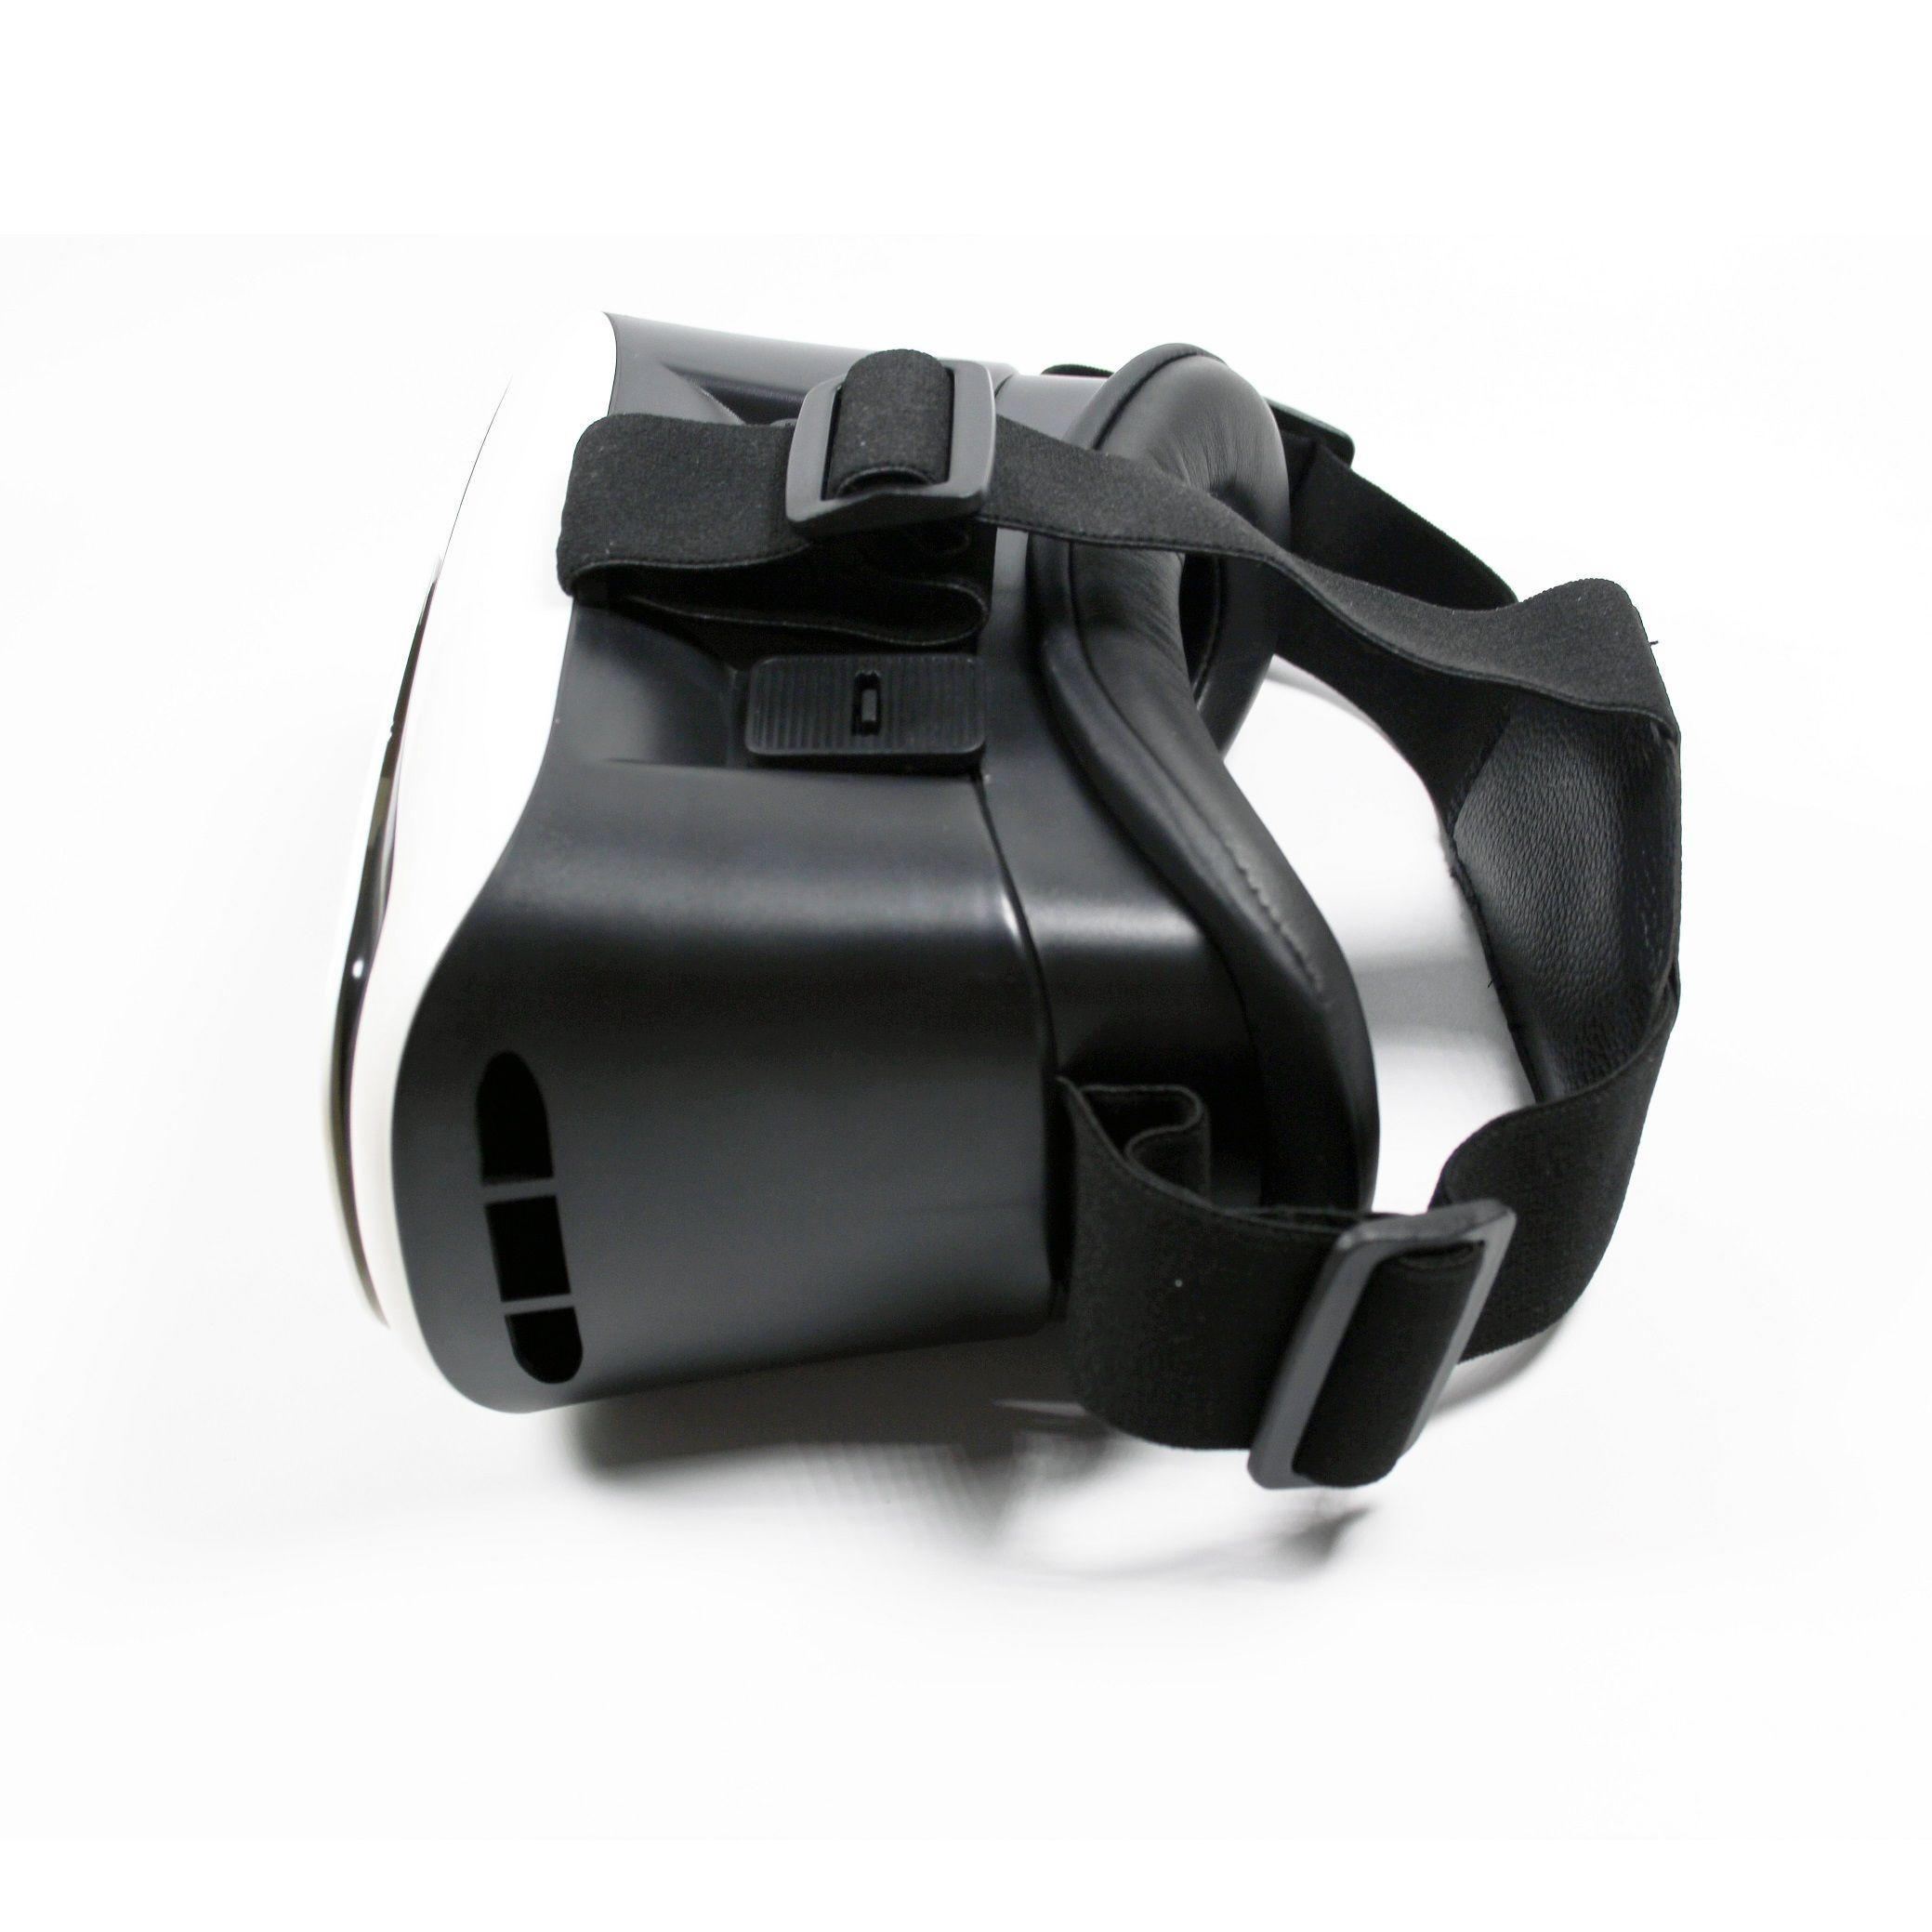 Gafas 3D Langboss VR BOX 2.0 para IOSAndroid Smartphone Realidad virtual Gafas de video en 3D + Bluetooth Remote Gamepad